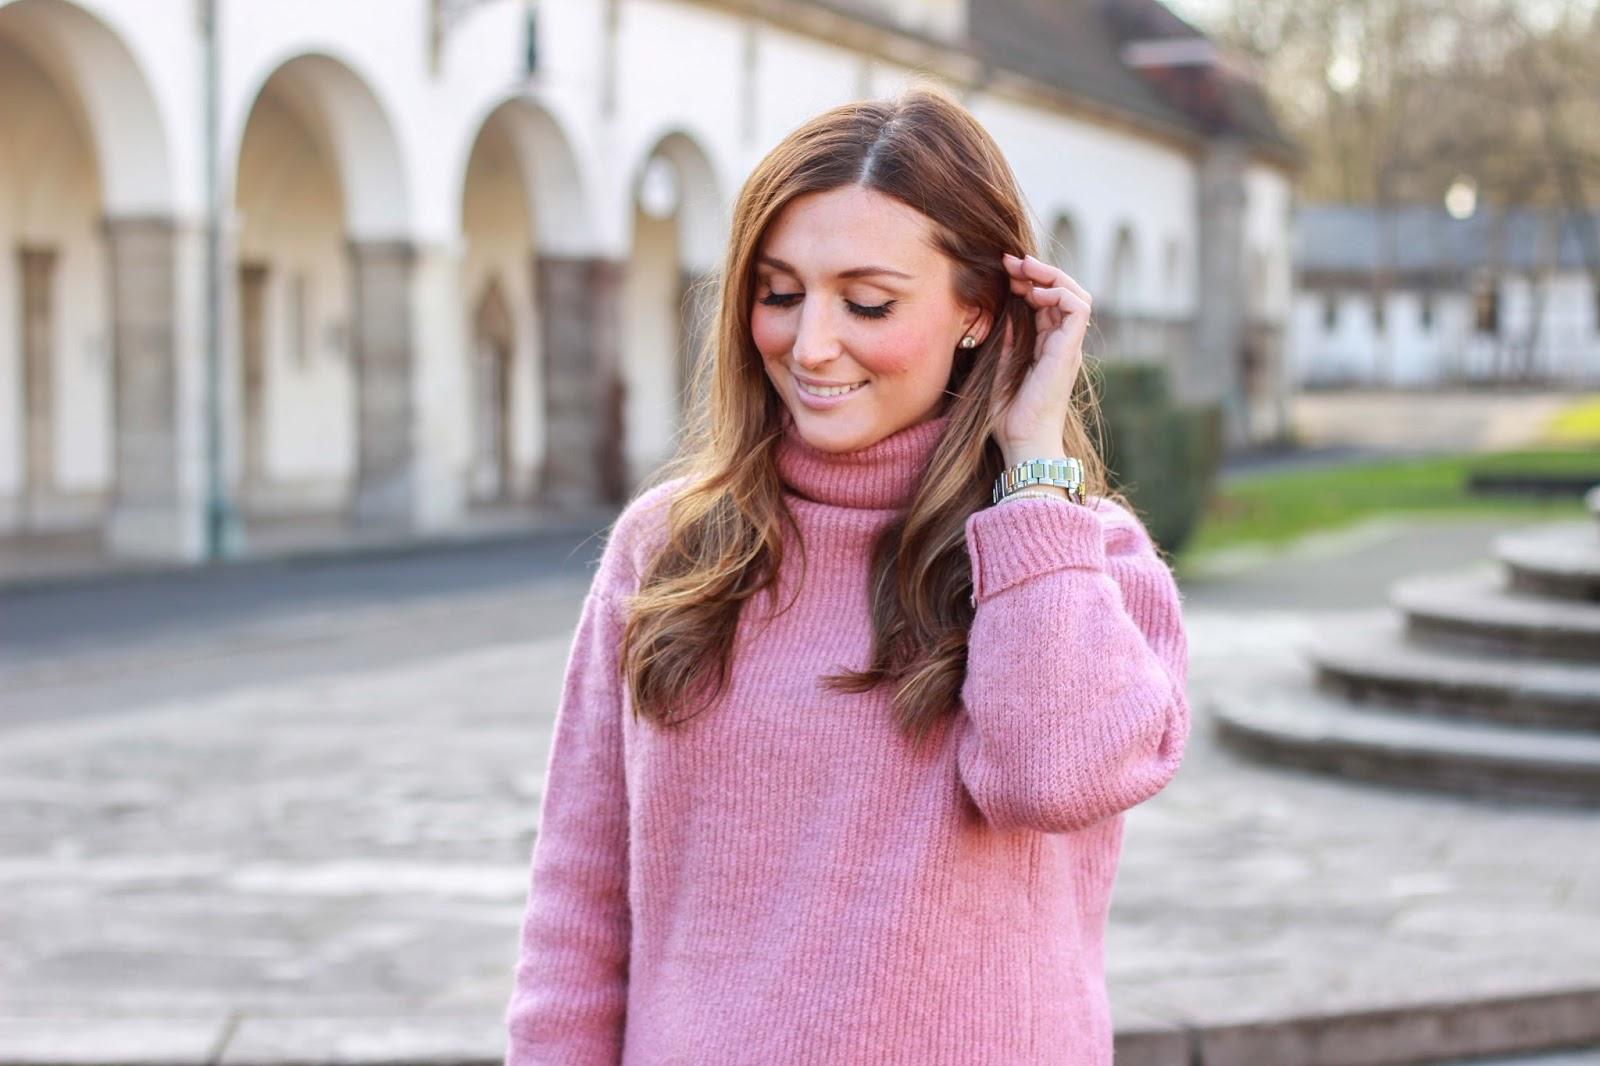 Fashionstylebyjohanna - German Fashionblogger - Outfitinspiration Modeblogger - Frankfurt Fashionblogger